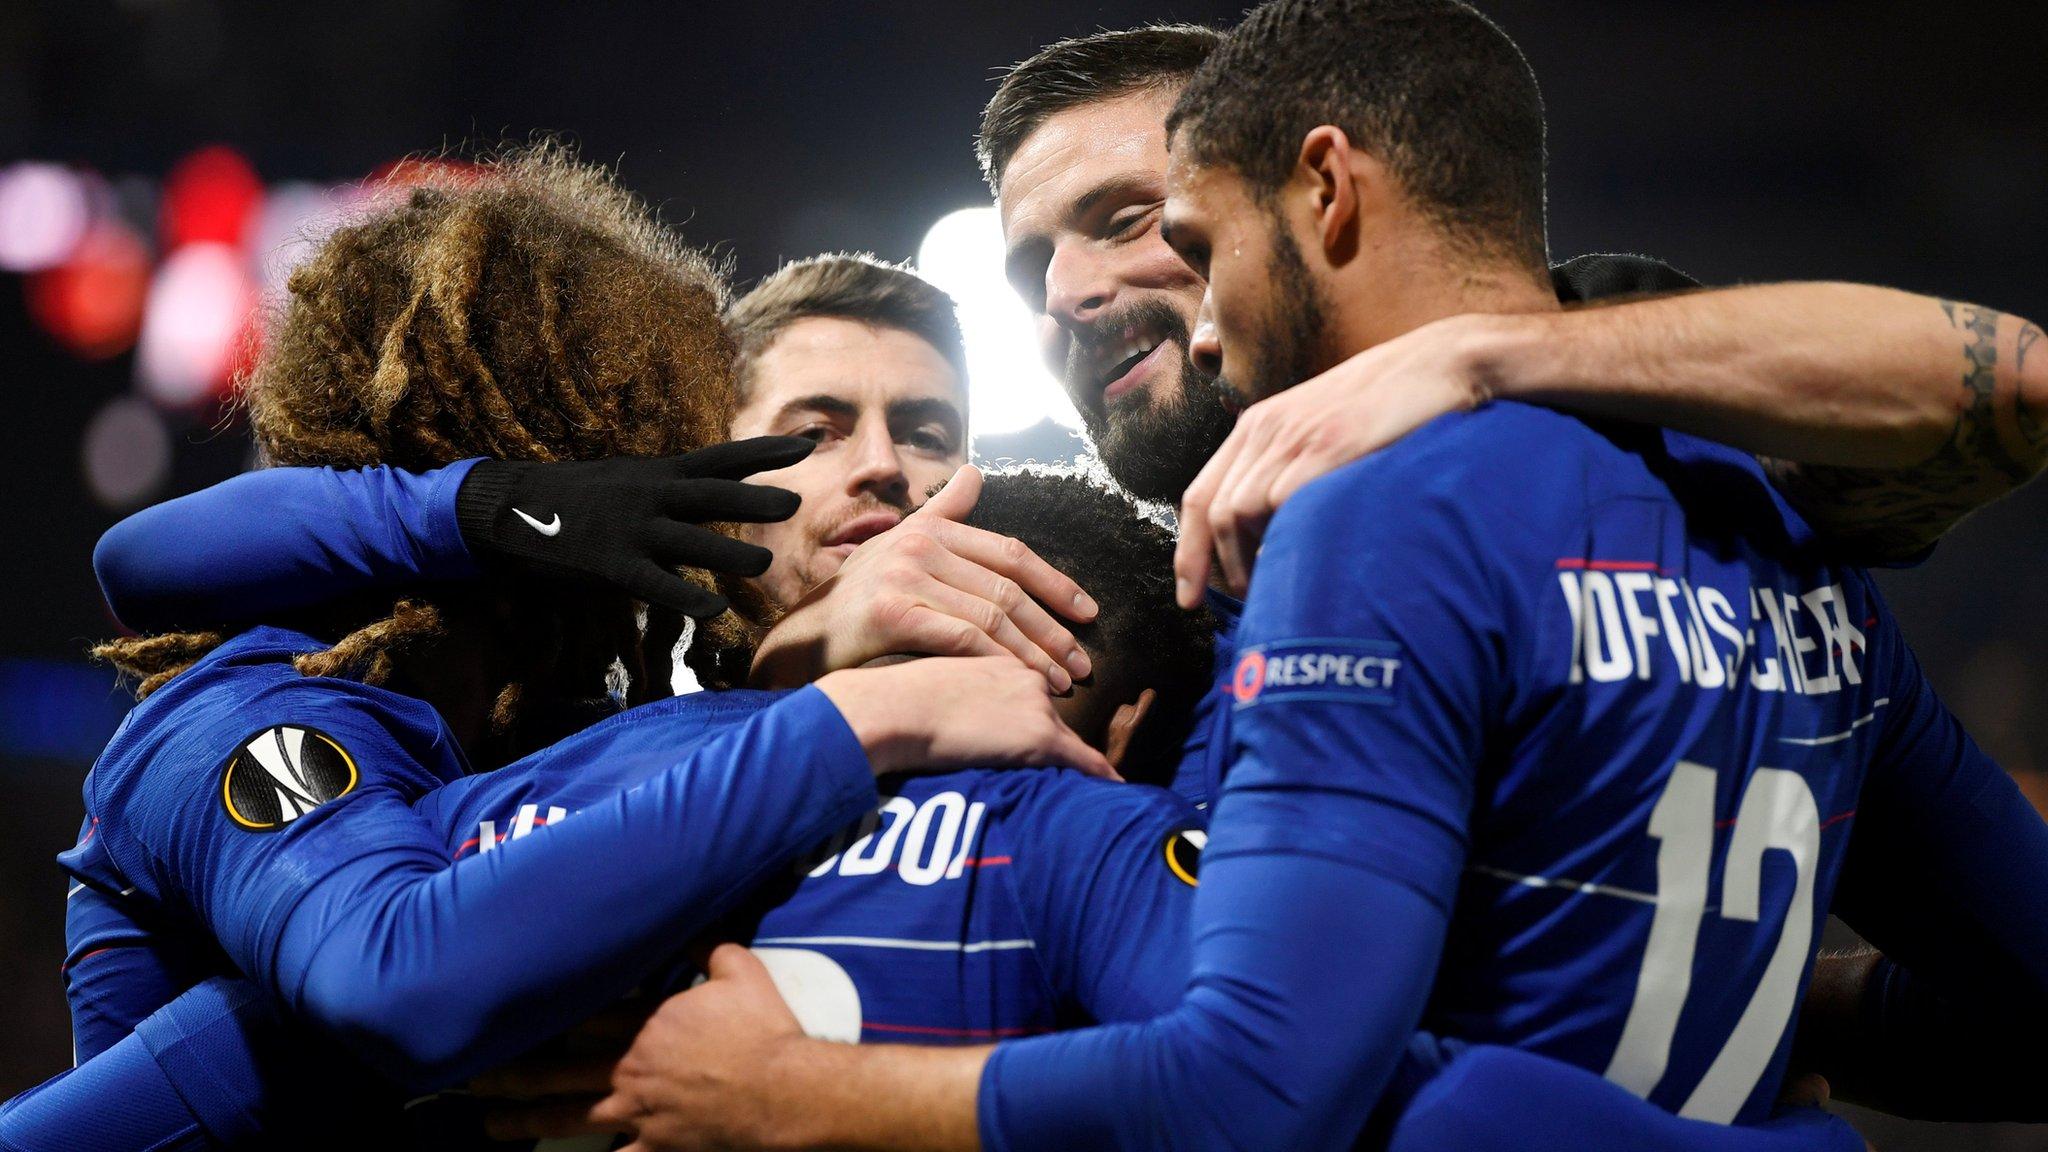 Chelsea 3-0 Malmo (5-1): Callum Hudson-Odoi scores as Blues reach last 16